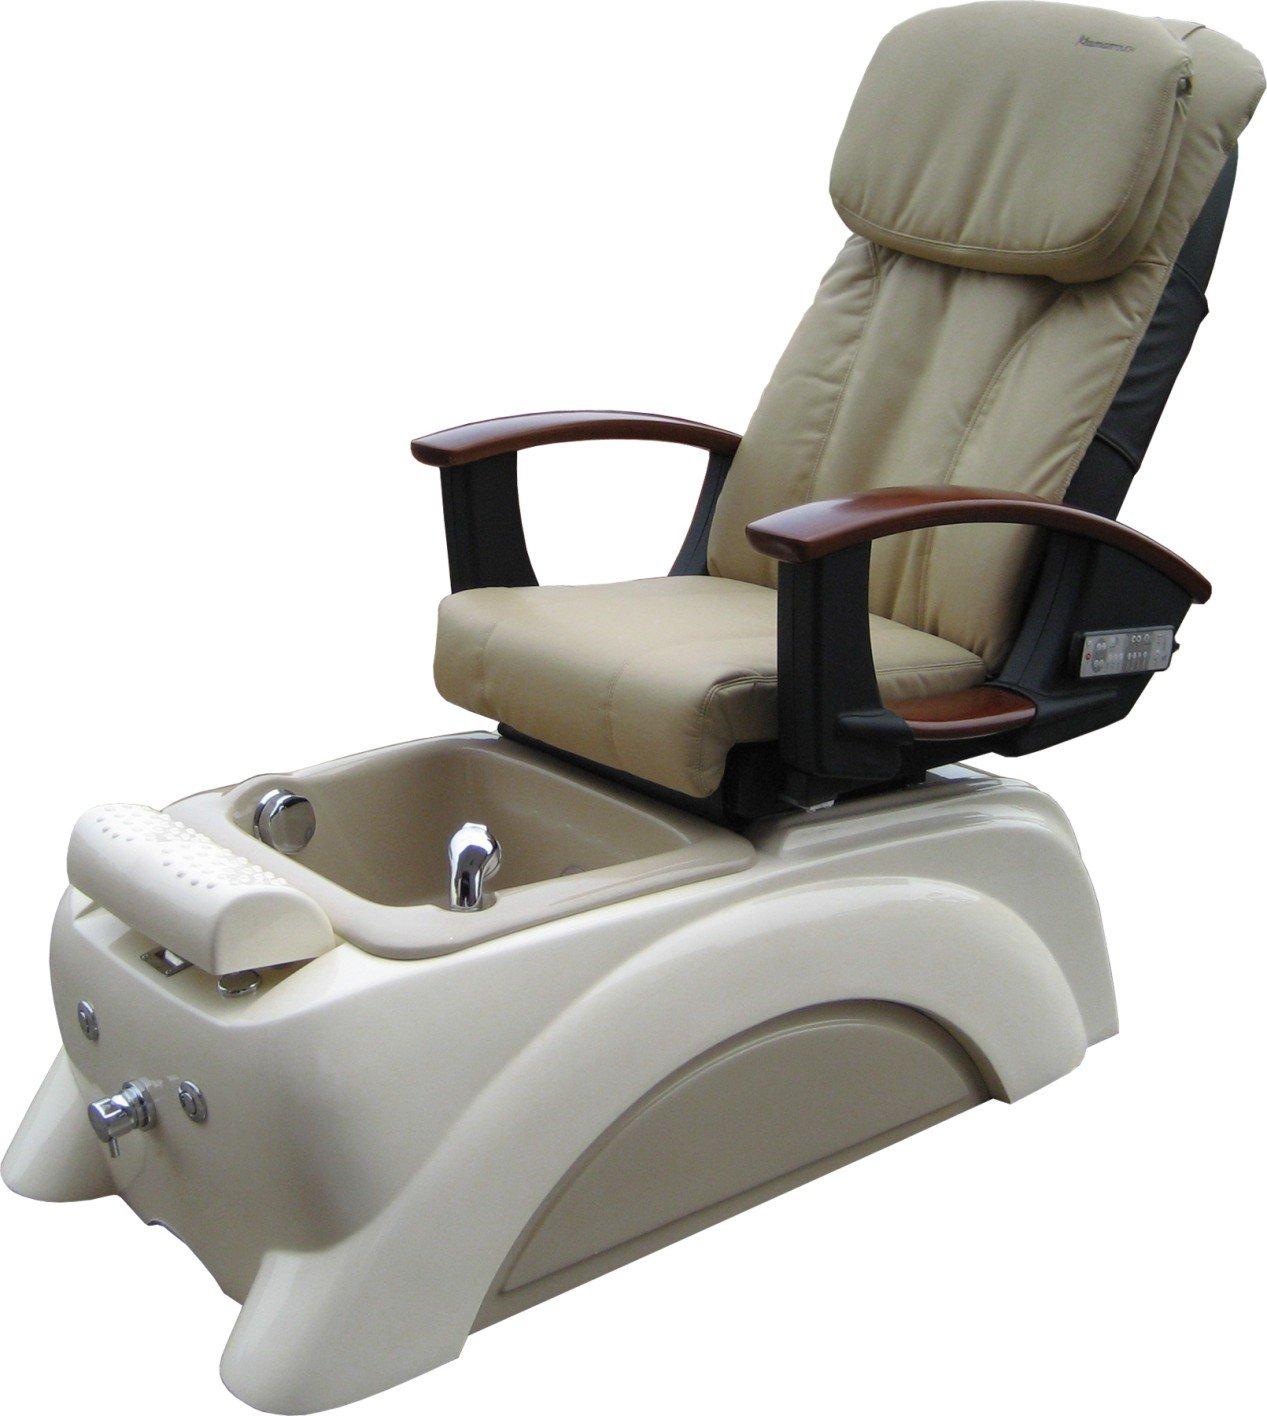 Spa pedicure chair pedicure chairs pedicure equipment pedicure spa - Spa Pedicure Chair Pedicure Chairs Pedicure Equipment Pedicure Spa 11